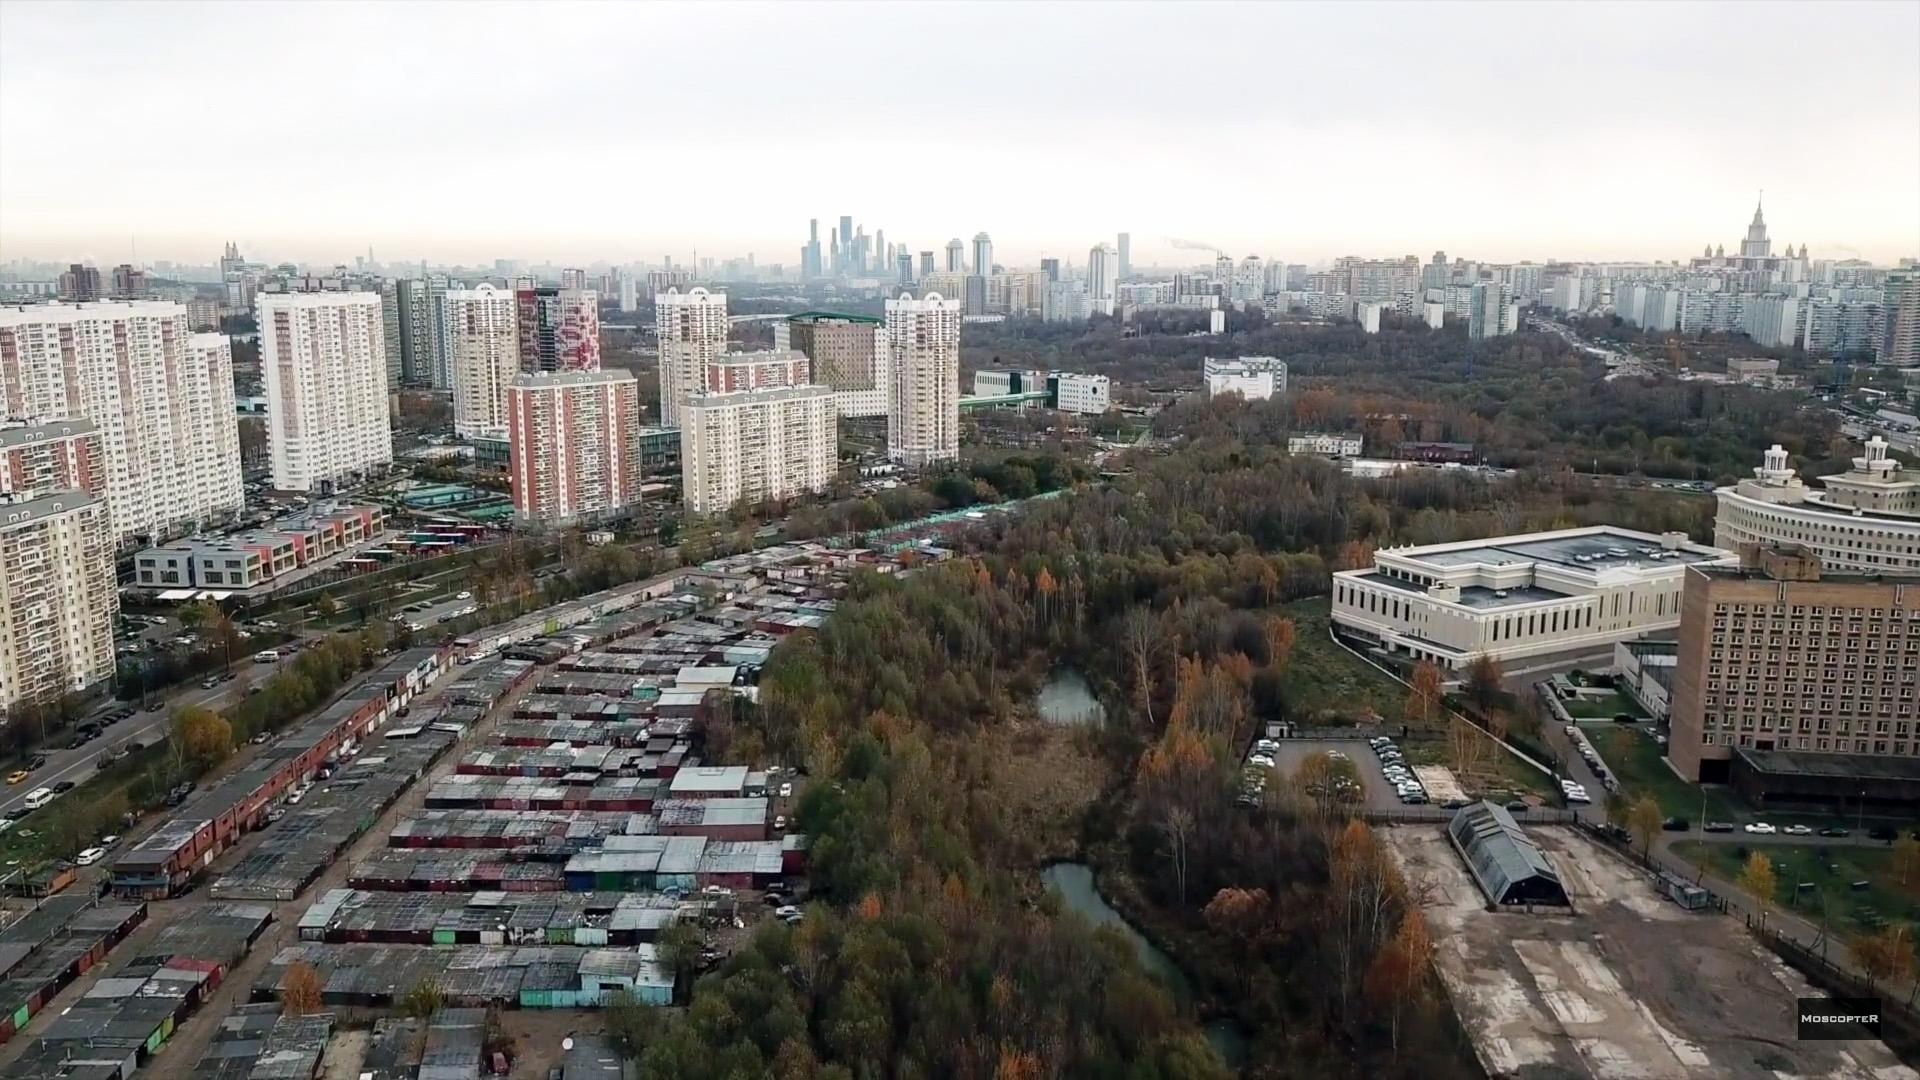 2017 Очаковский овраг и гаражи